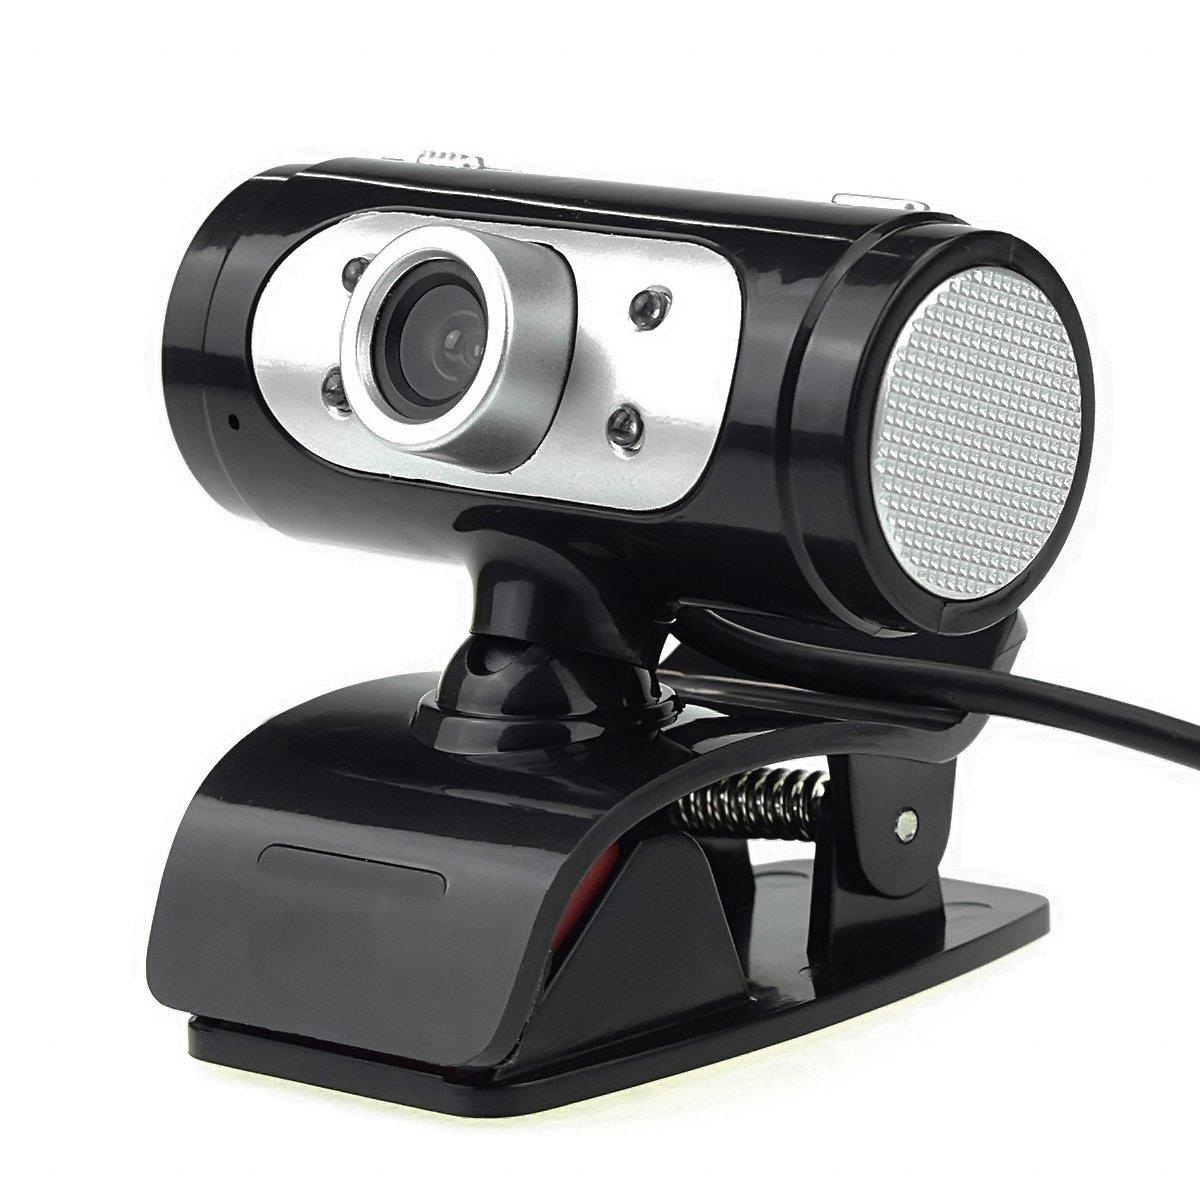 USB HD Webcam 1080P Video Web Camera with Built-in Sound Digital Microphone LED Lights for Desktop Laptop